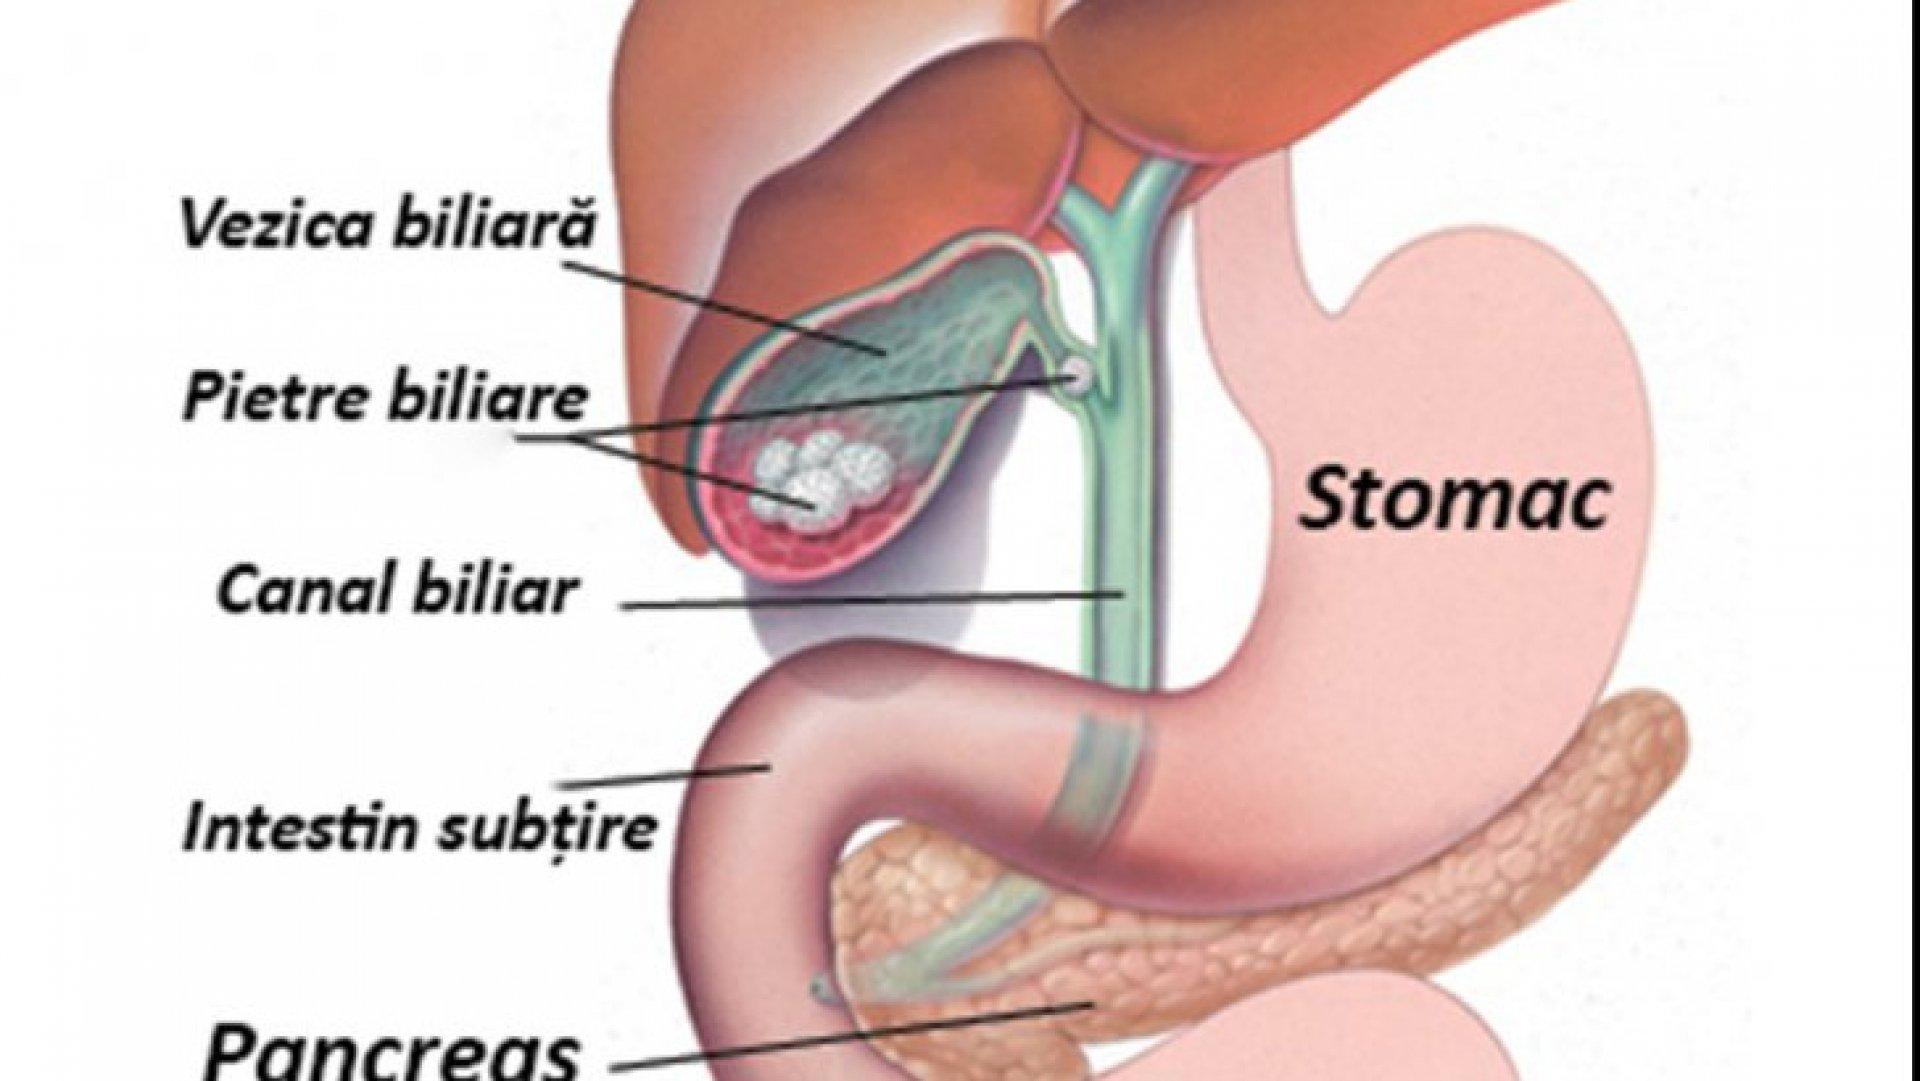 forum plat pentru negi uterine papiloma hpv transmissao